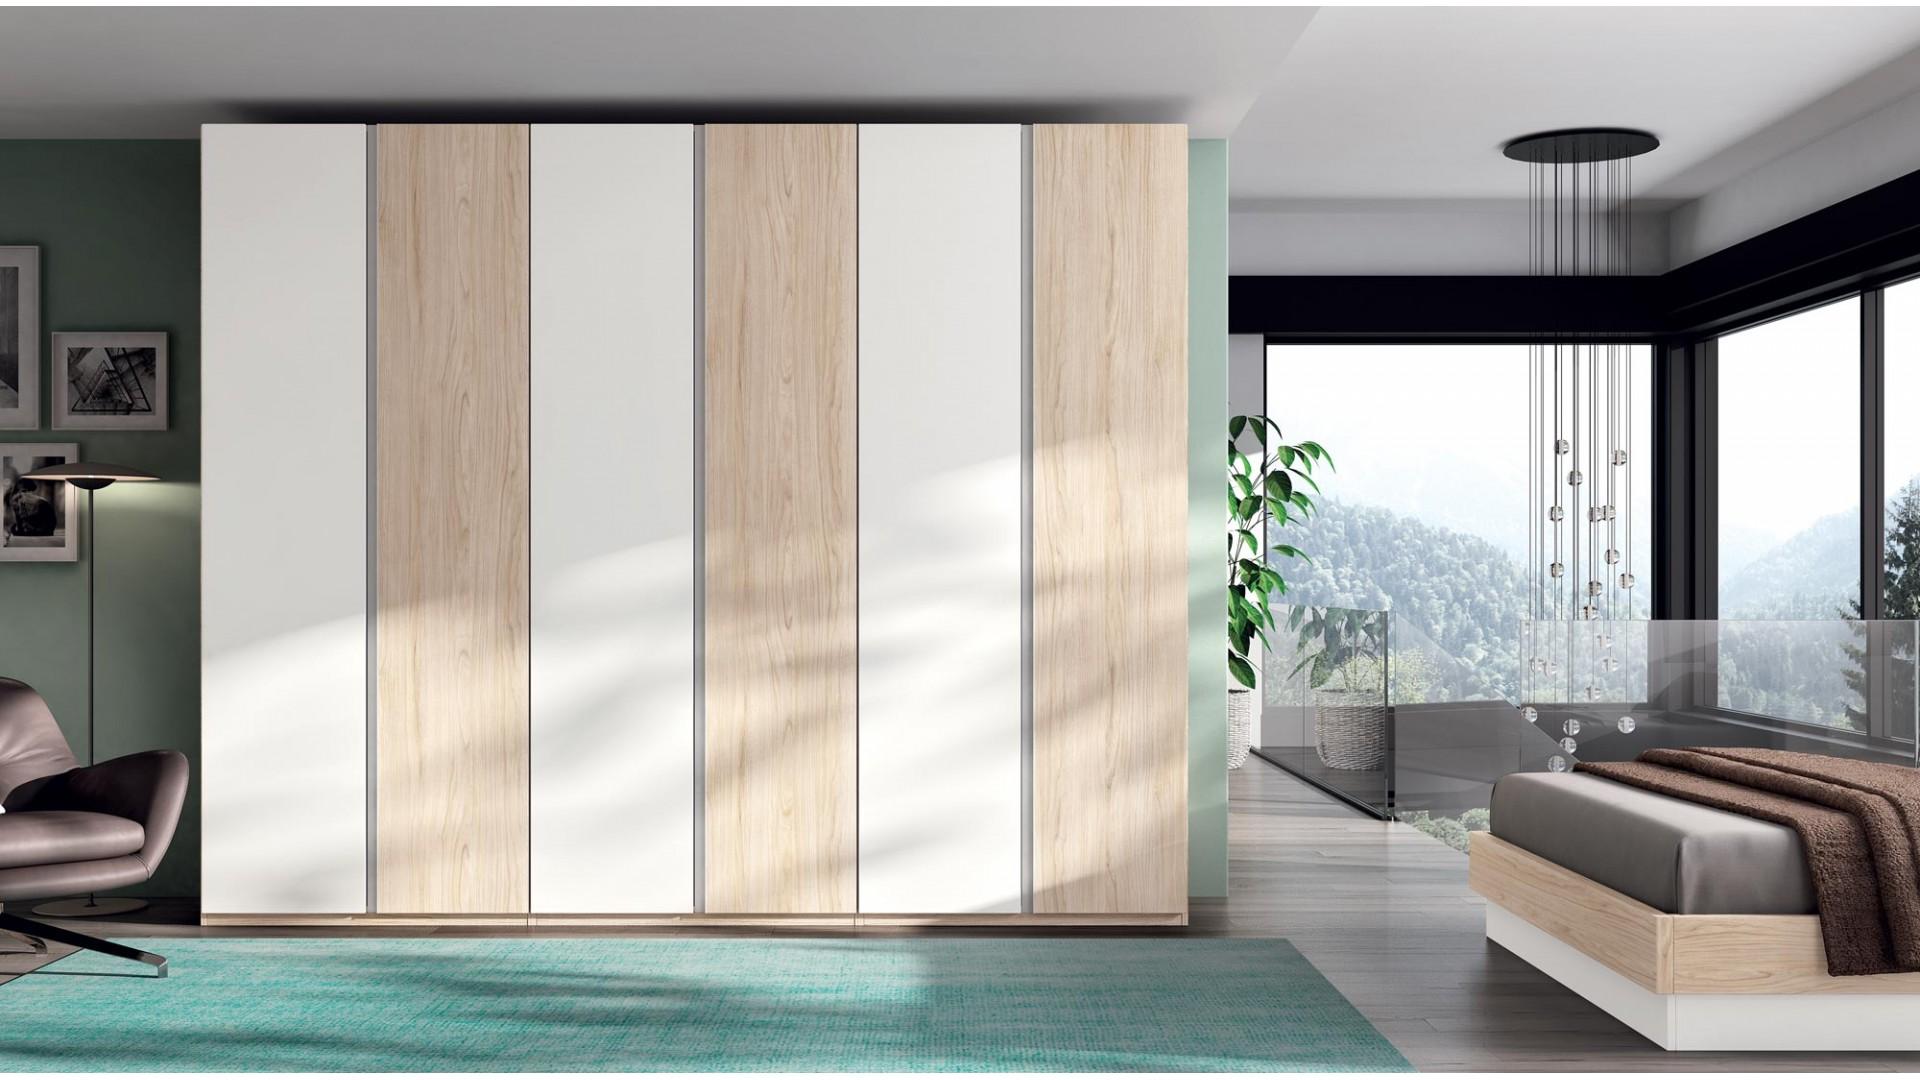 Armoire dressing 6 portes battantes PERSONNALISABLE COSMO60 - GLICERIO